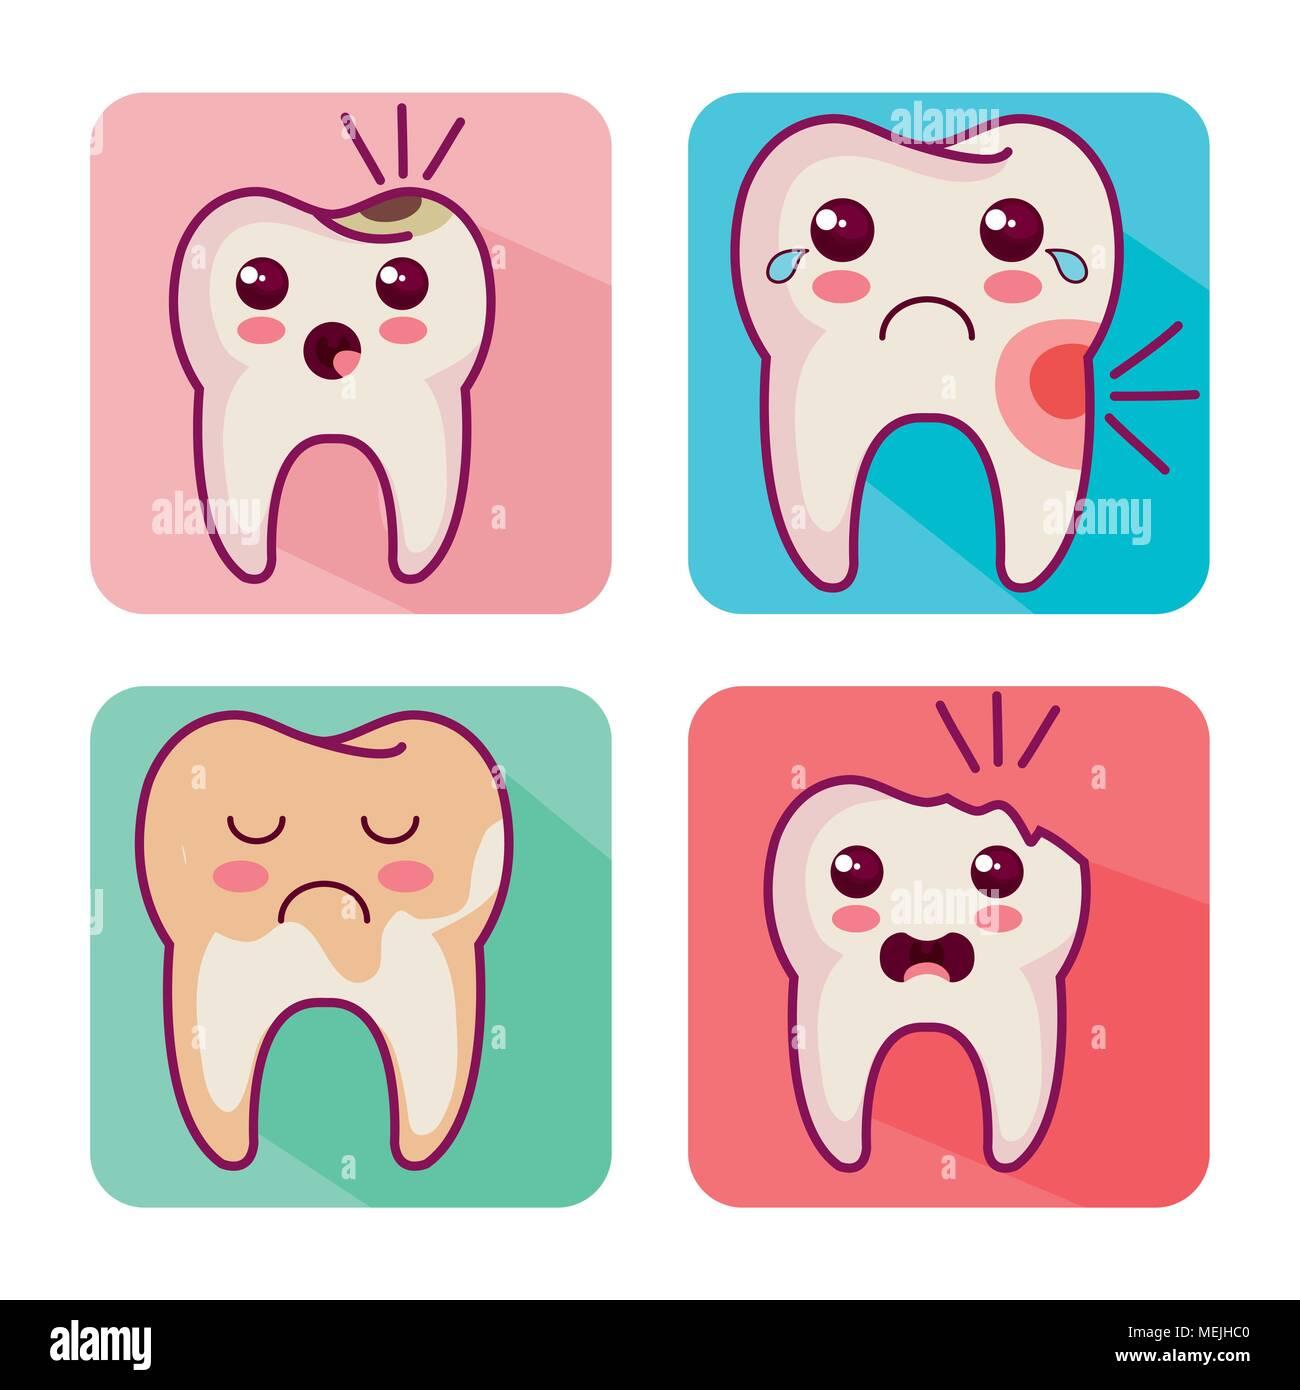 dental care kawaii characters - Stock Image